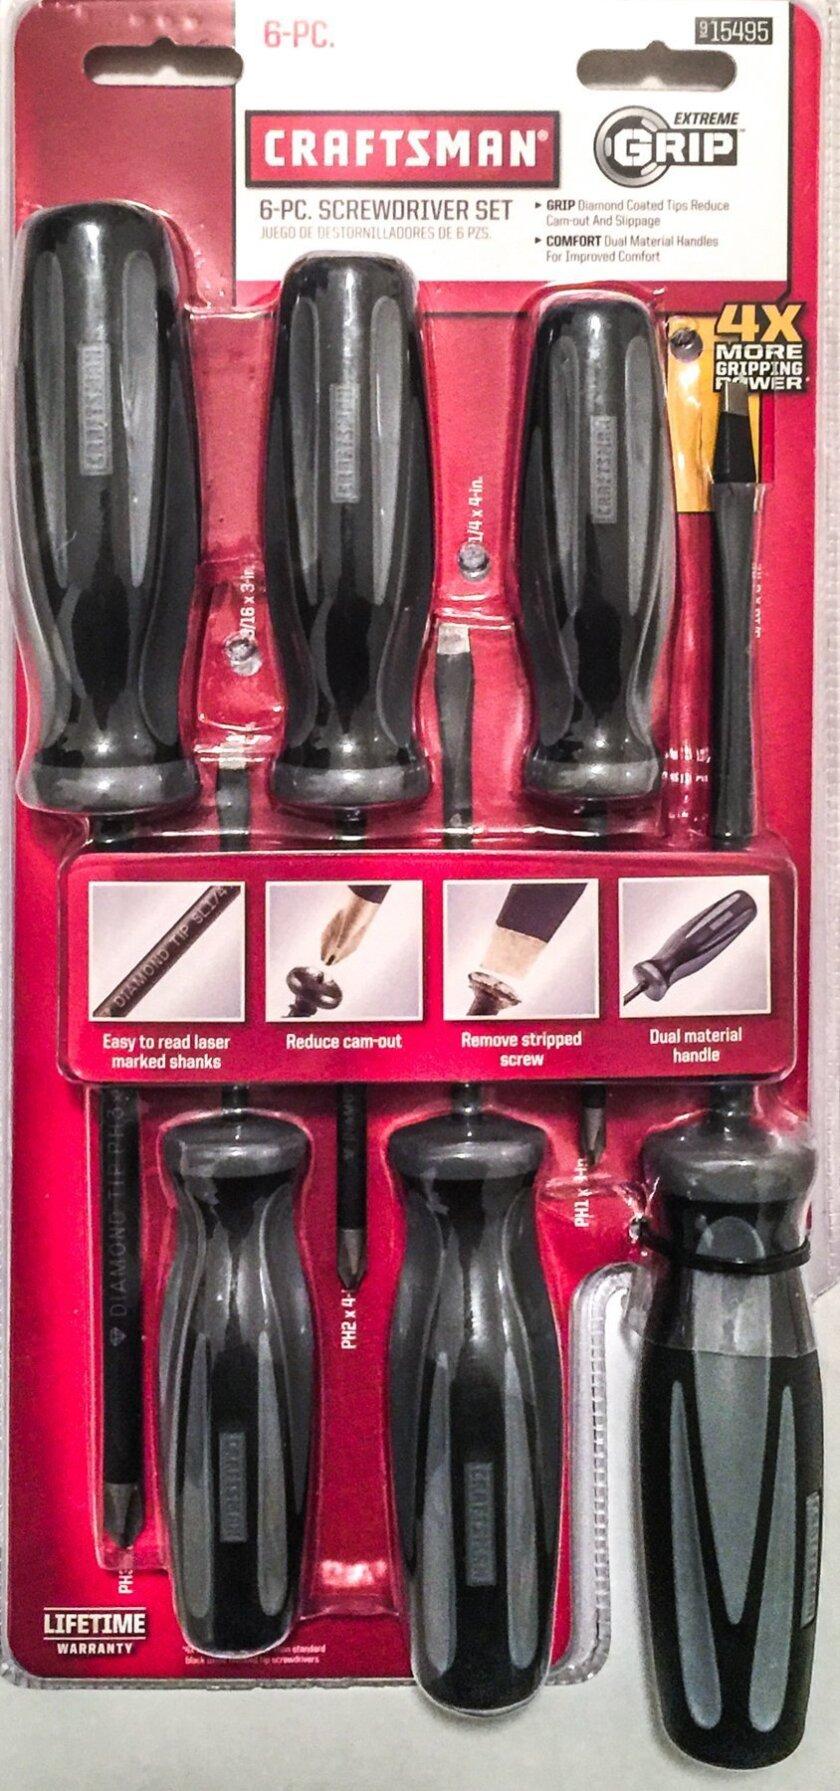 "Craftsman ""Extreme Grip"" screwdrivers"